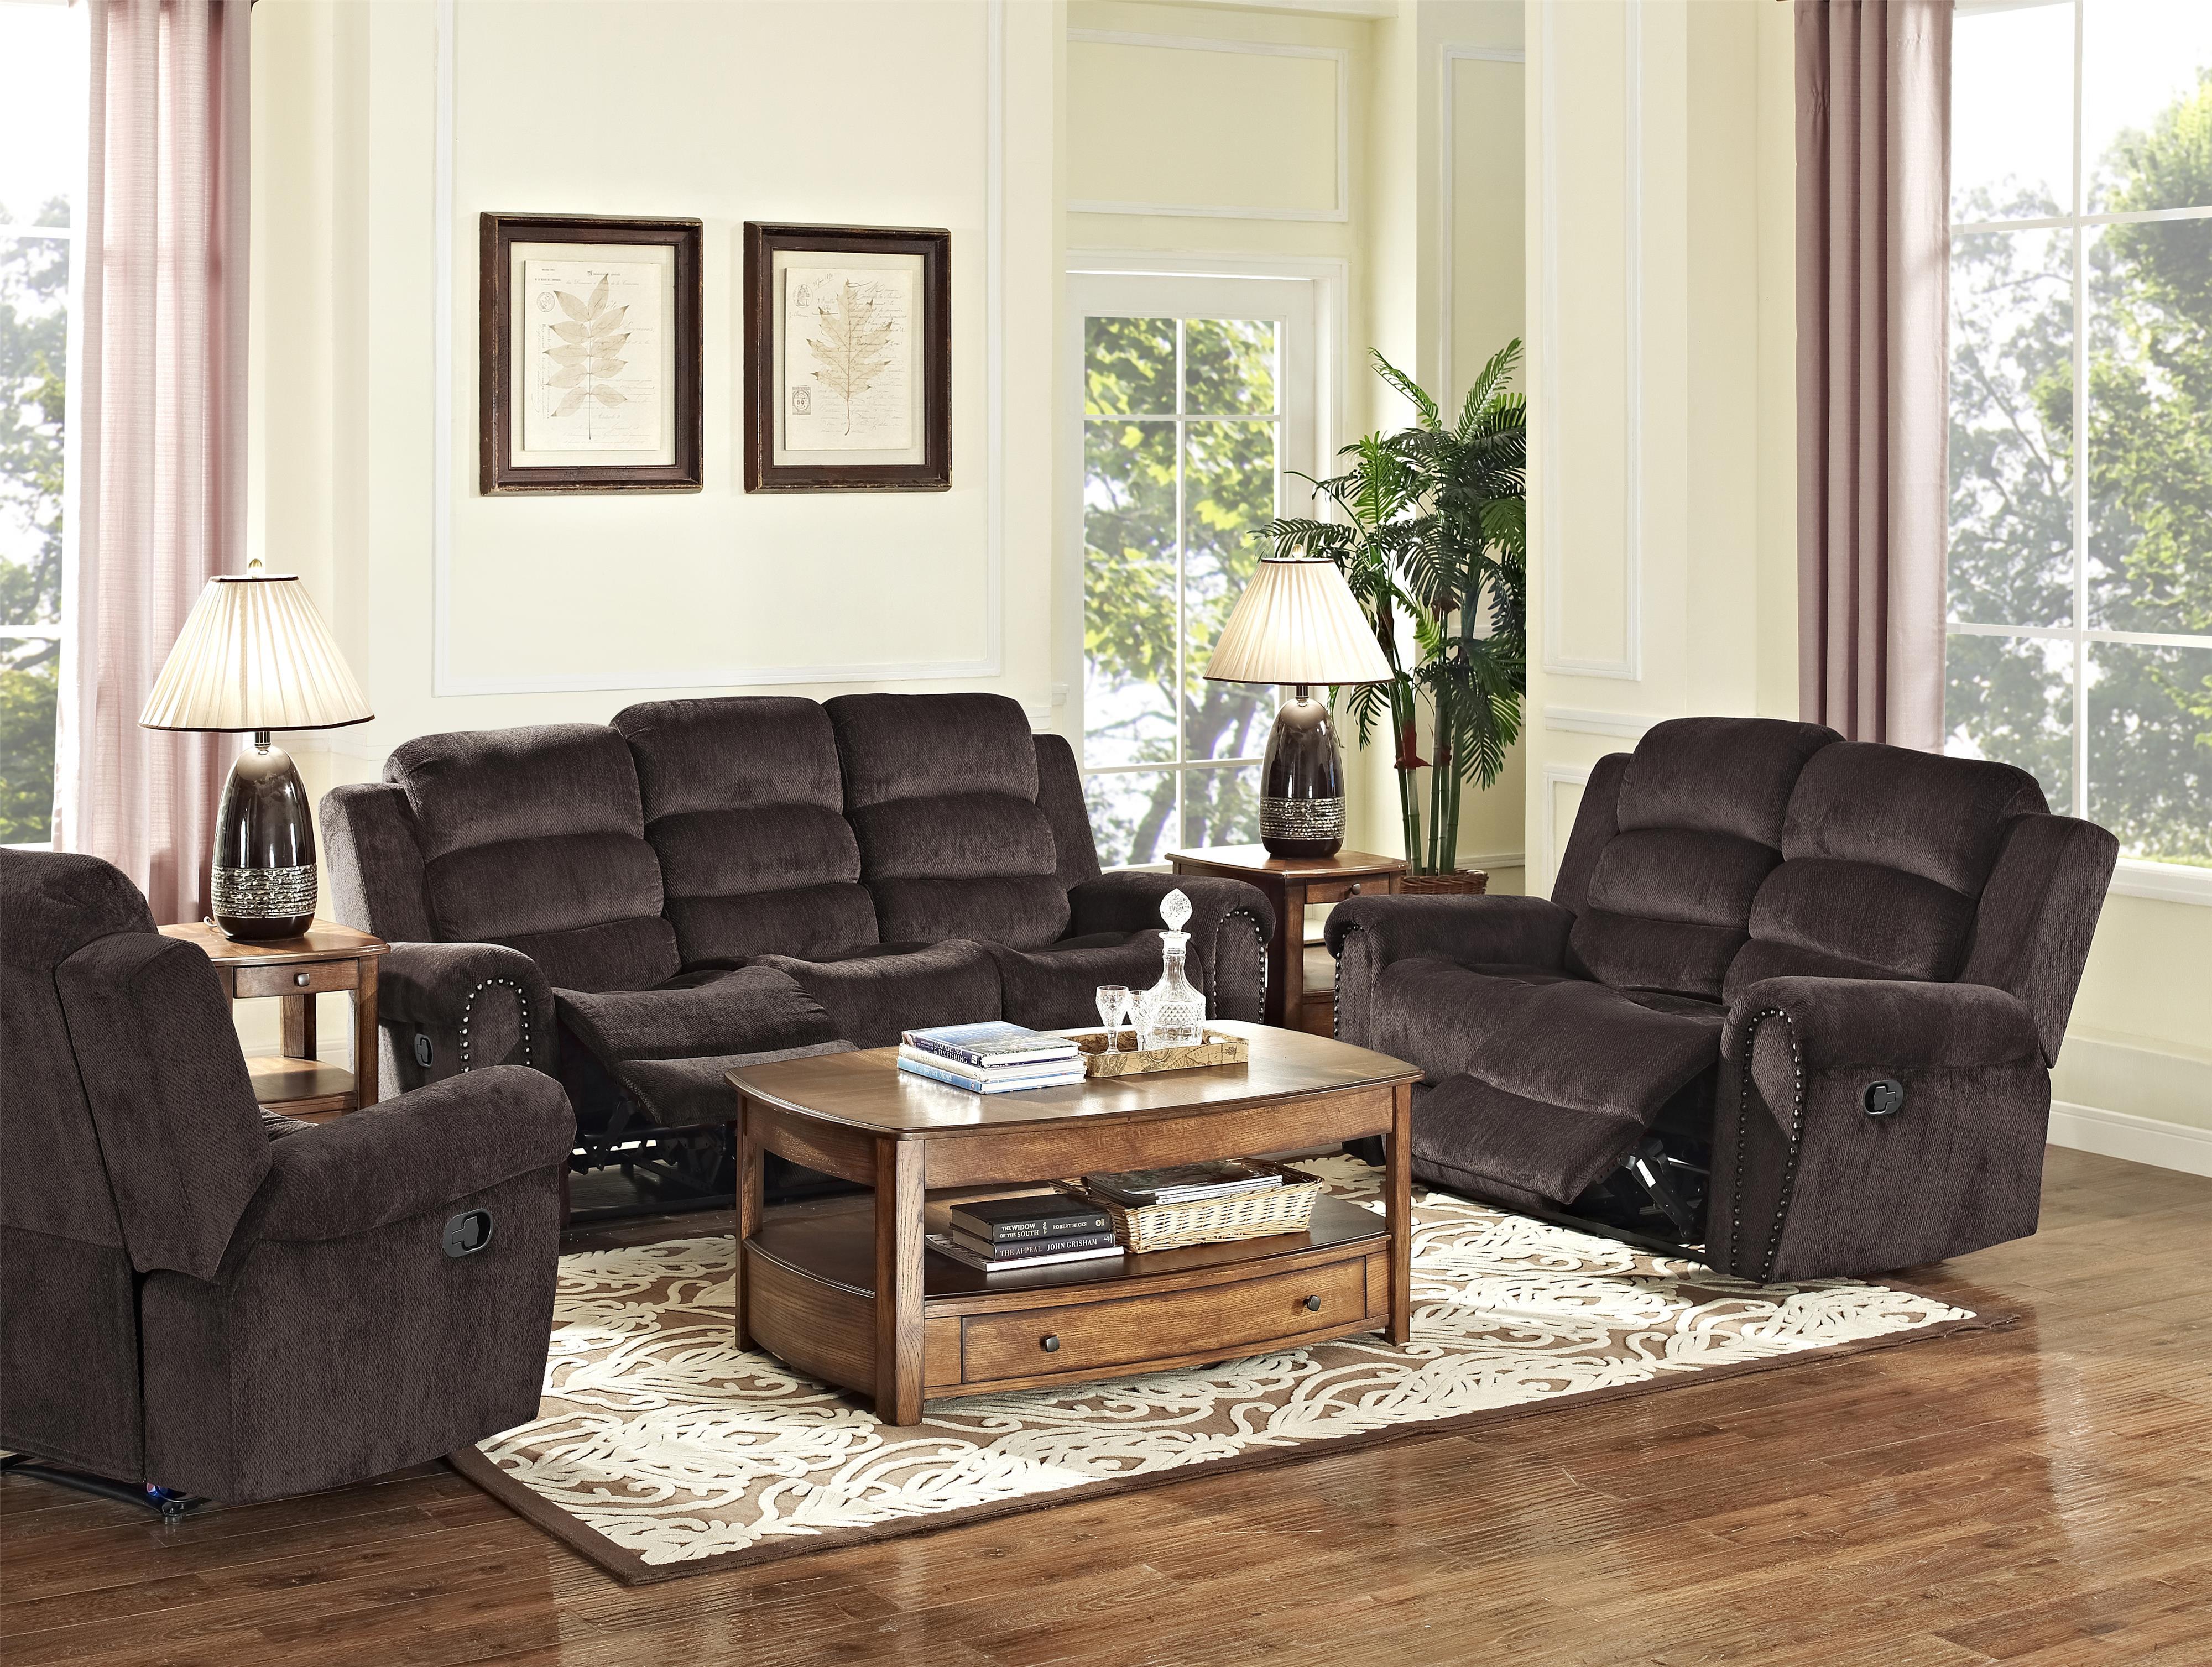 New Classic Merritt Reclining Living Room Group - Item Number: 2221 Reclining Living Room Group 1